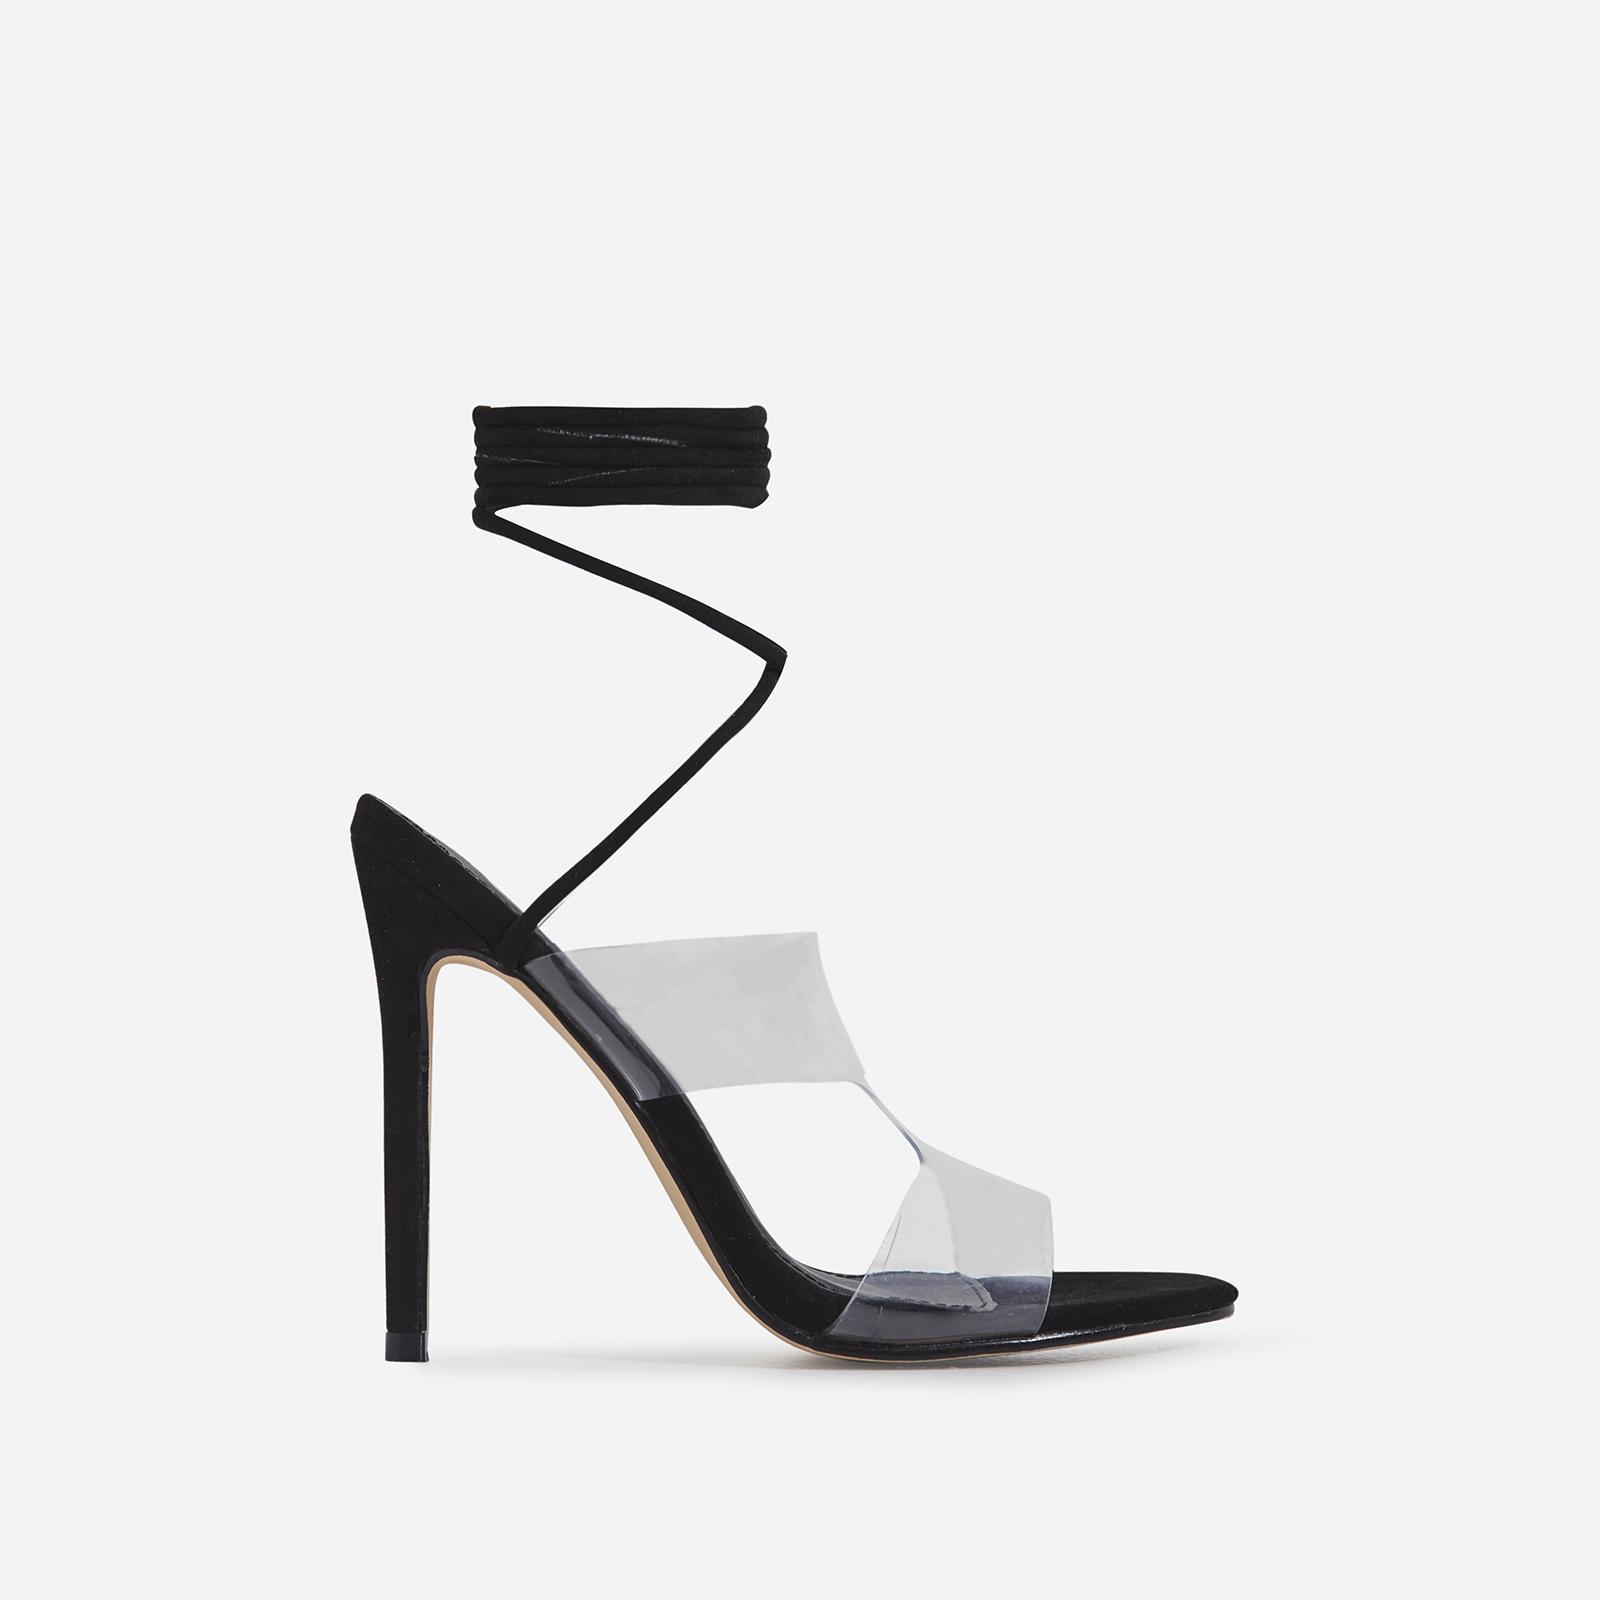 Vivica Lace Up Perspex Heel In Black Faux Suede